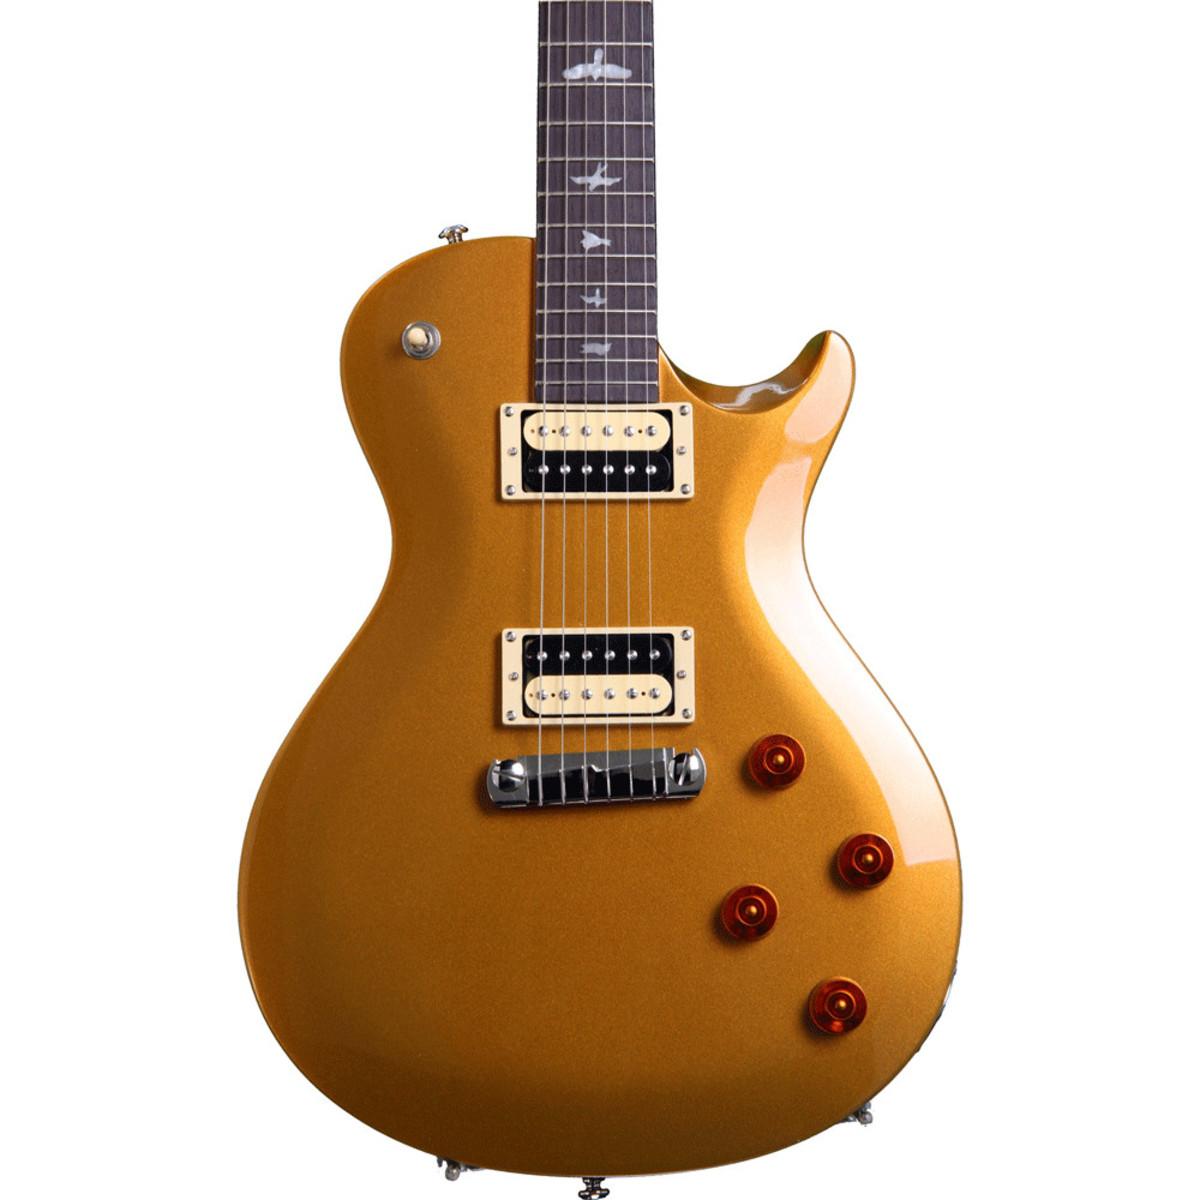 prs se 245 electric guitar gold metallic ex demo at gear4music. Black Bedroom Furniture Sets. Home Design Ideas